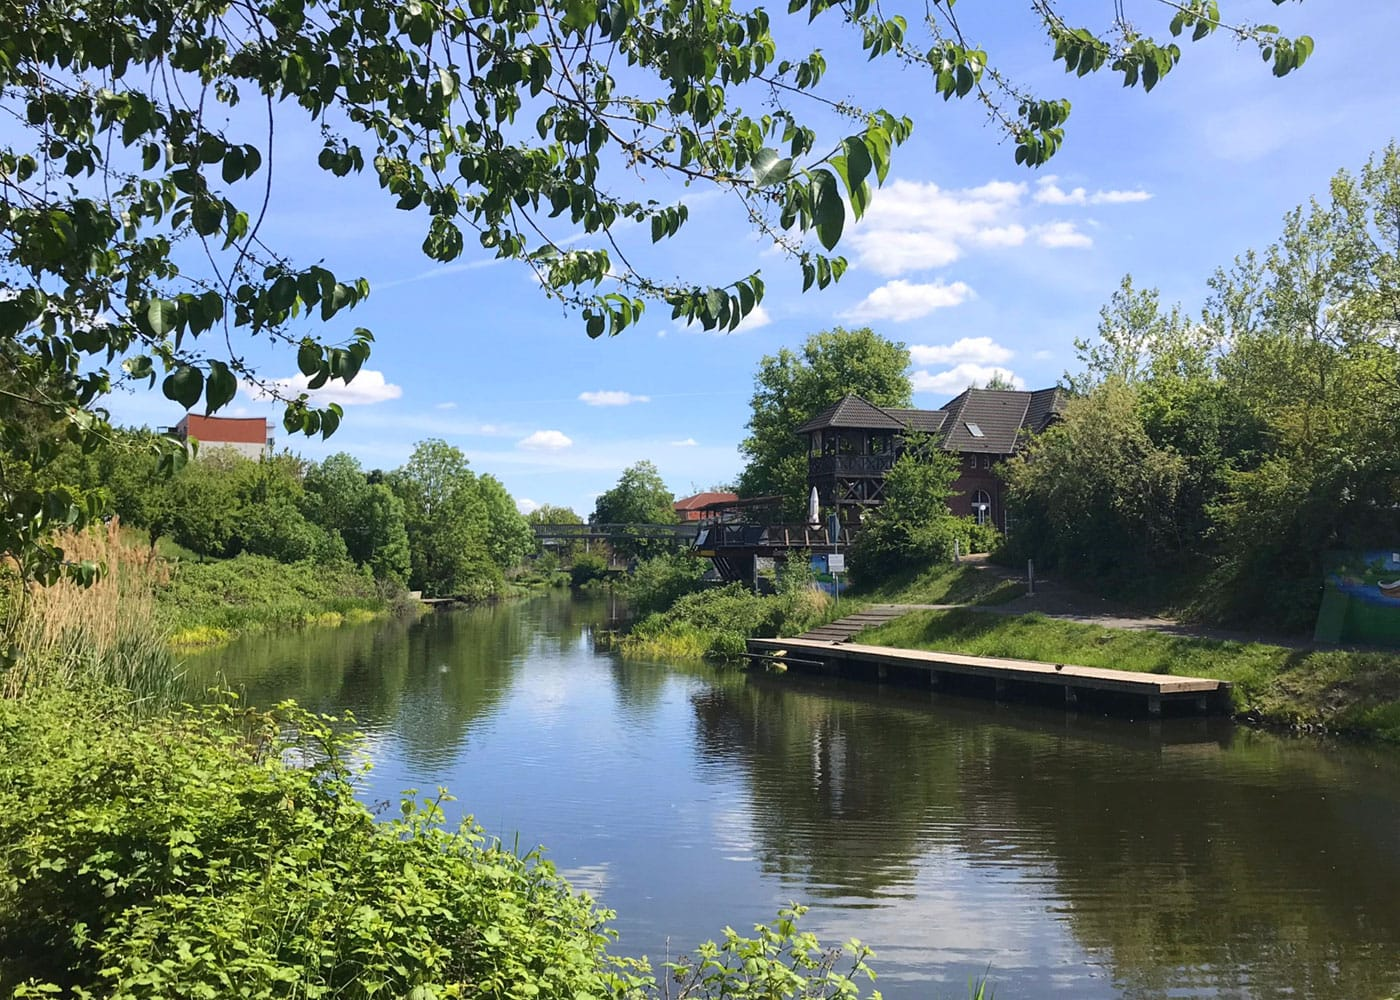 Familien-Ausflugstipp: Treidelweg bei Eberswalde // HIMBEER